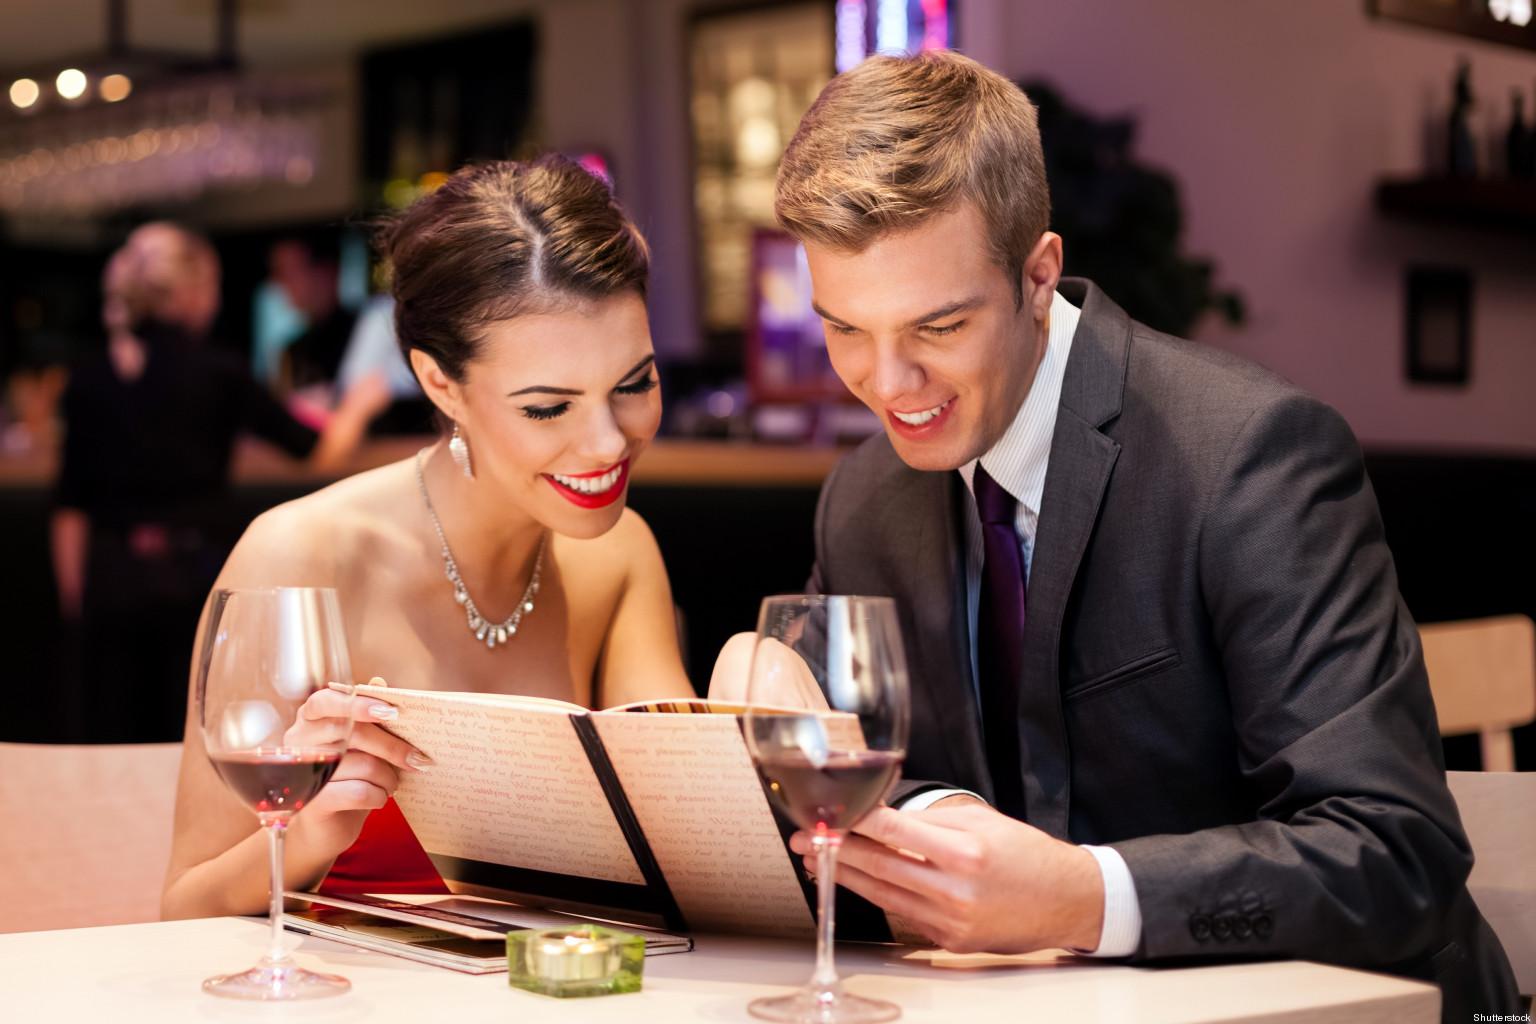 netherlands dating sites free